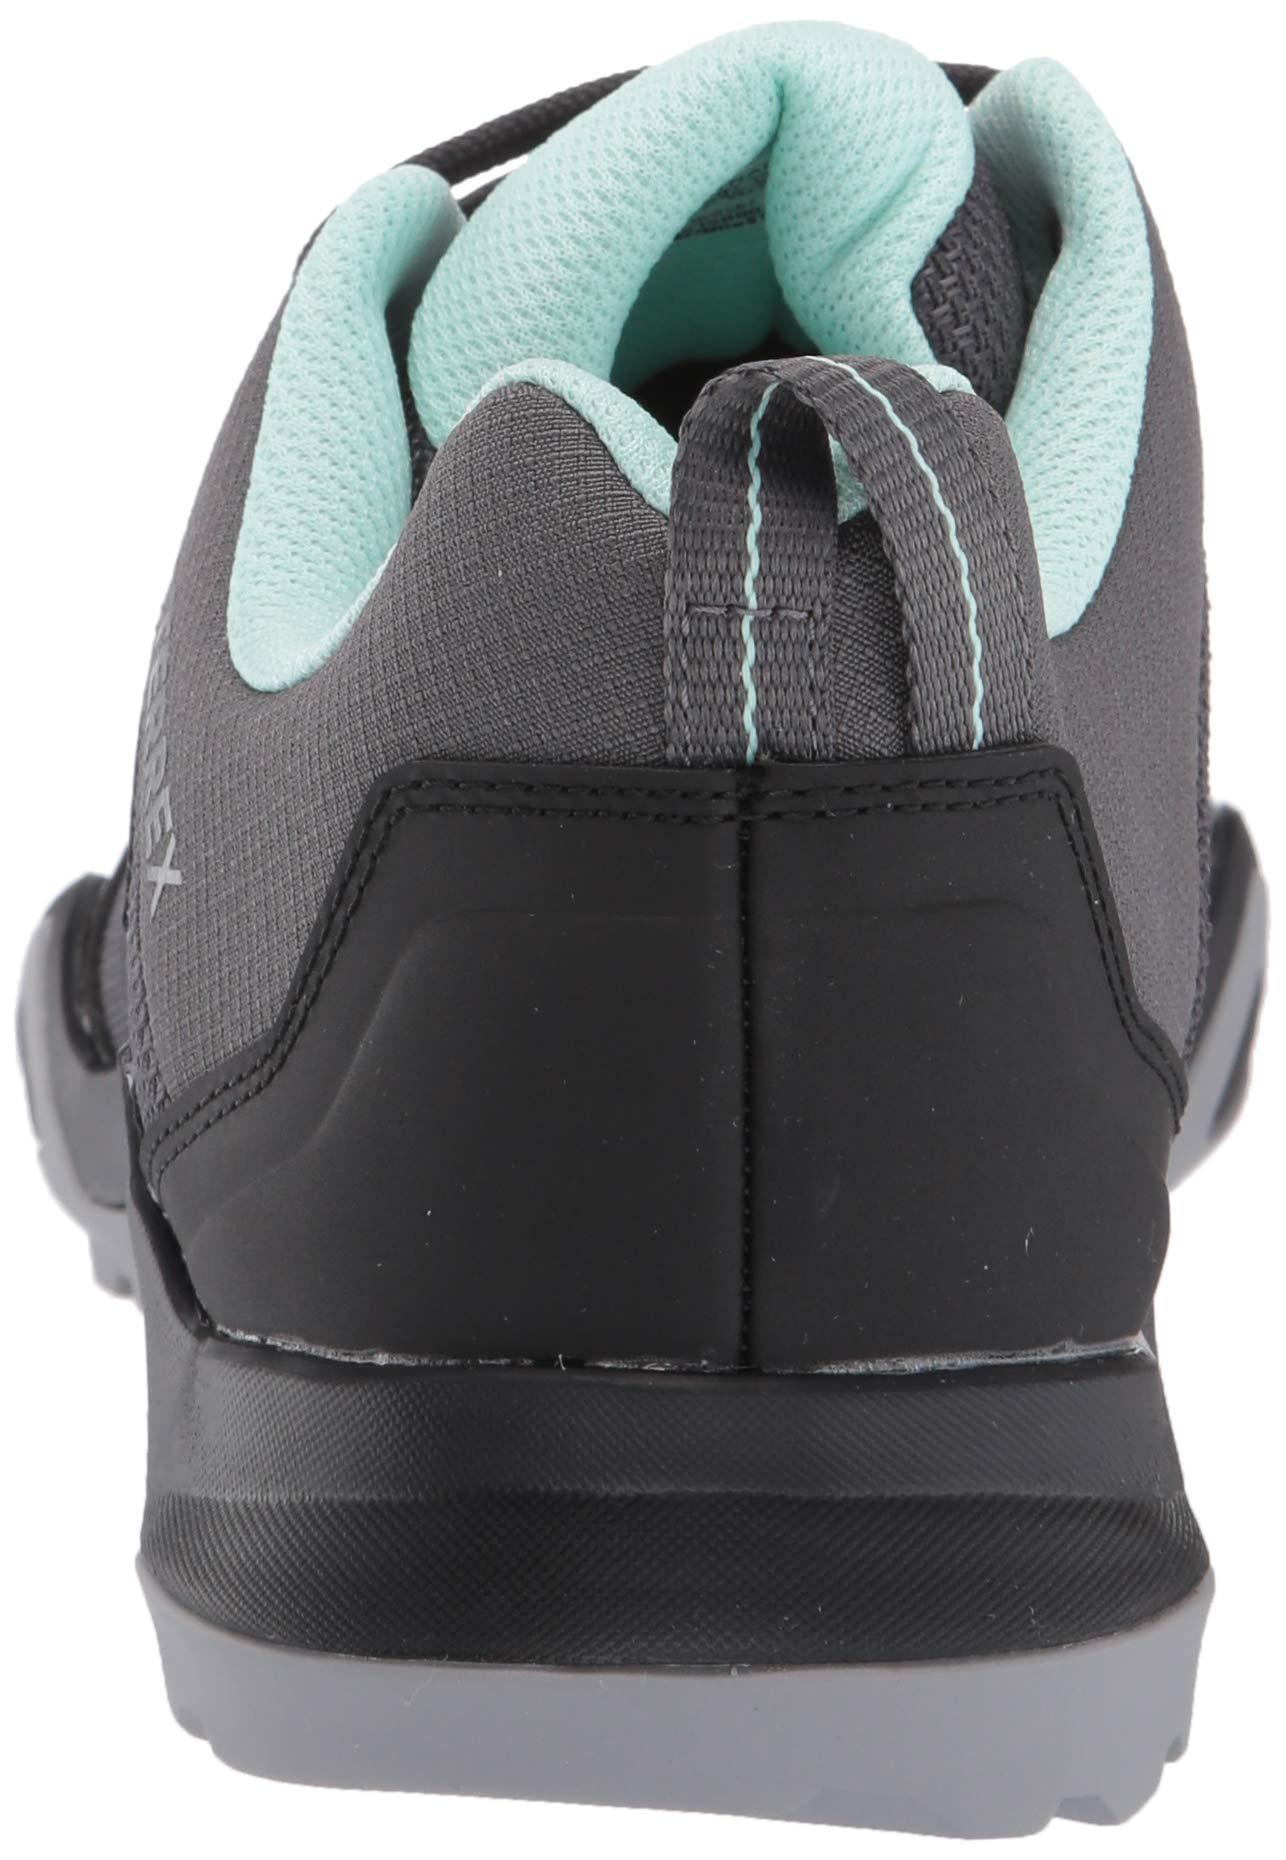 adidas outdoor Women's Terrex AX3